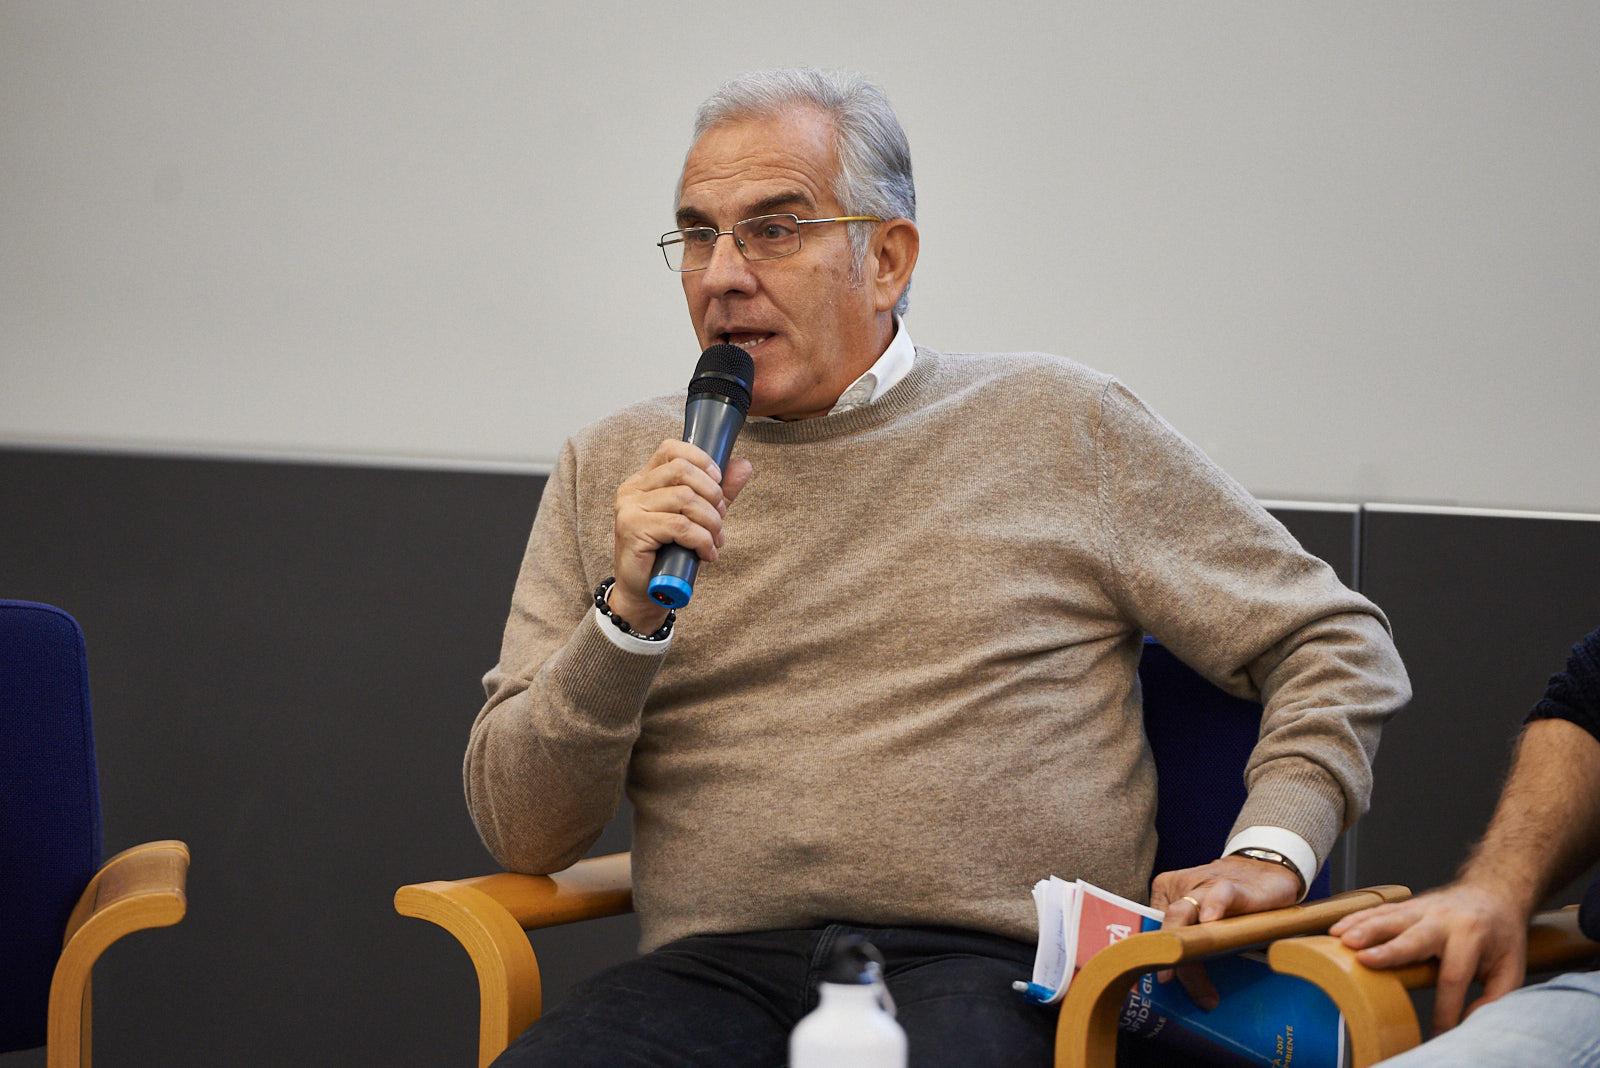 Marco Marchei, maratoneta olimpico